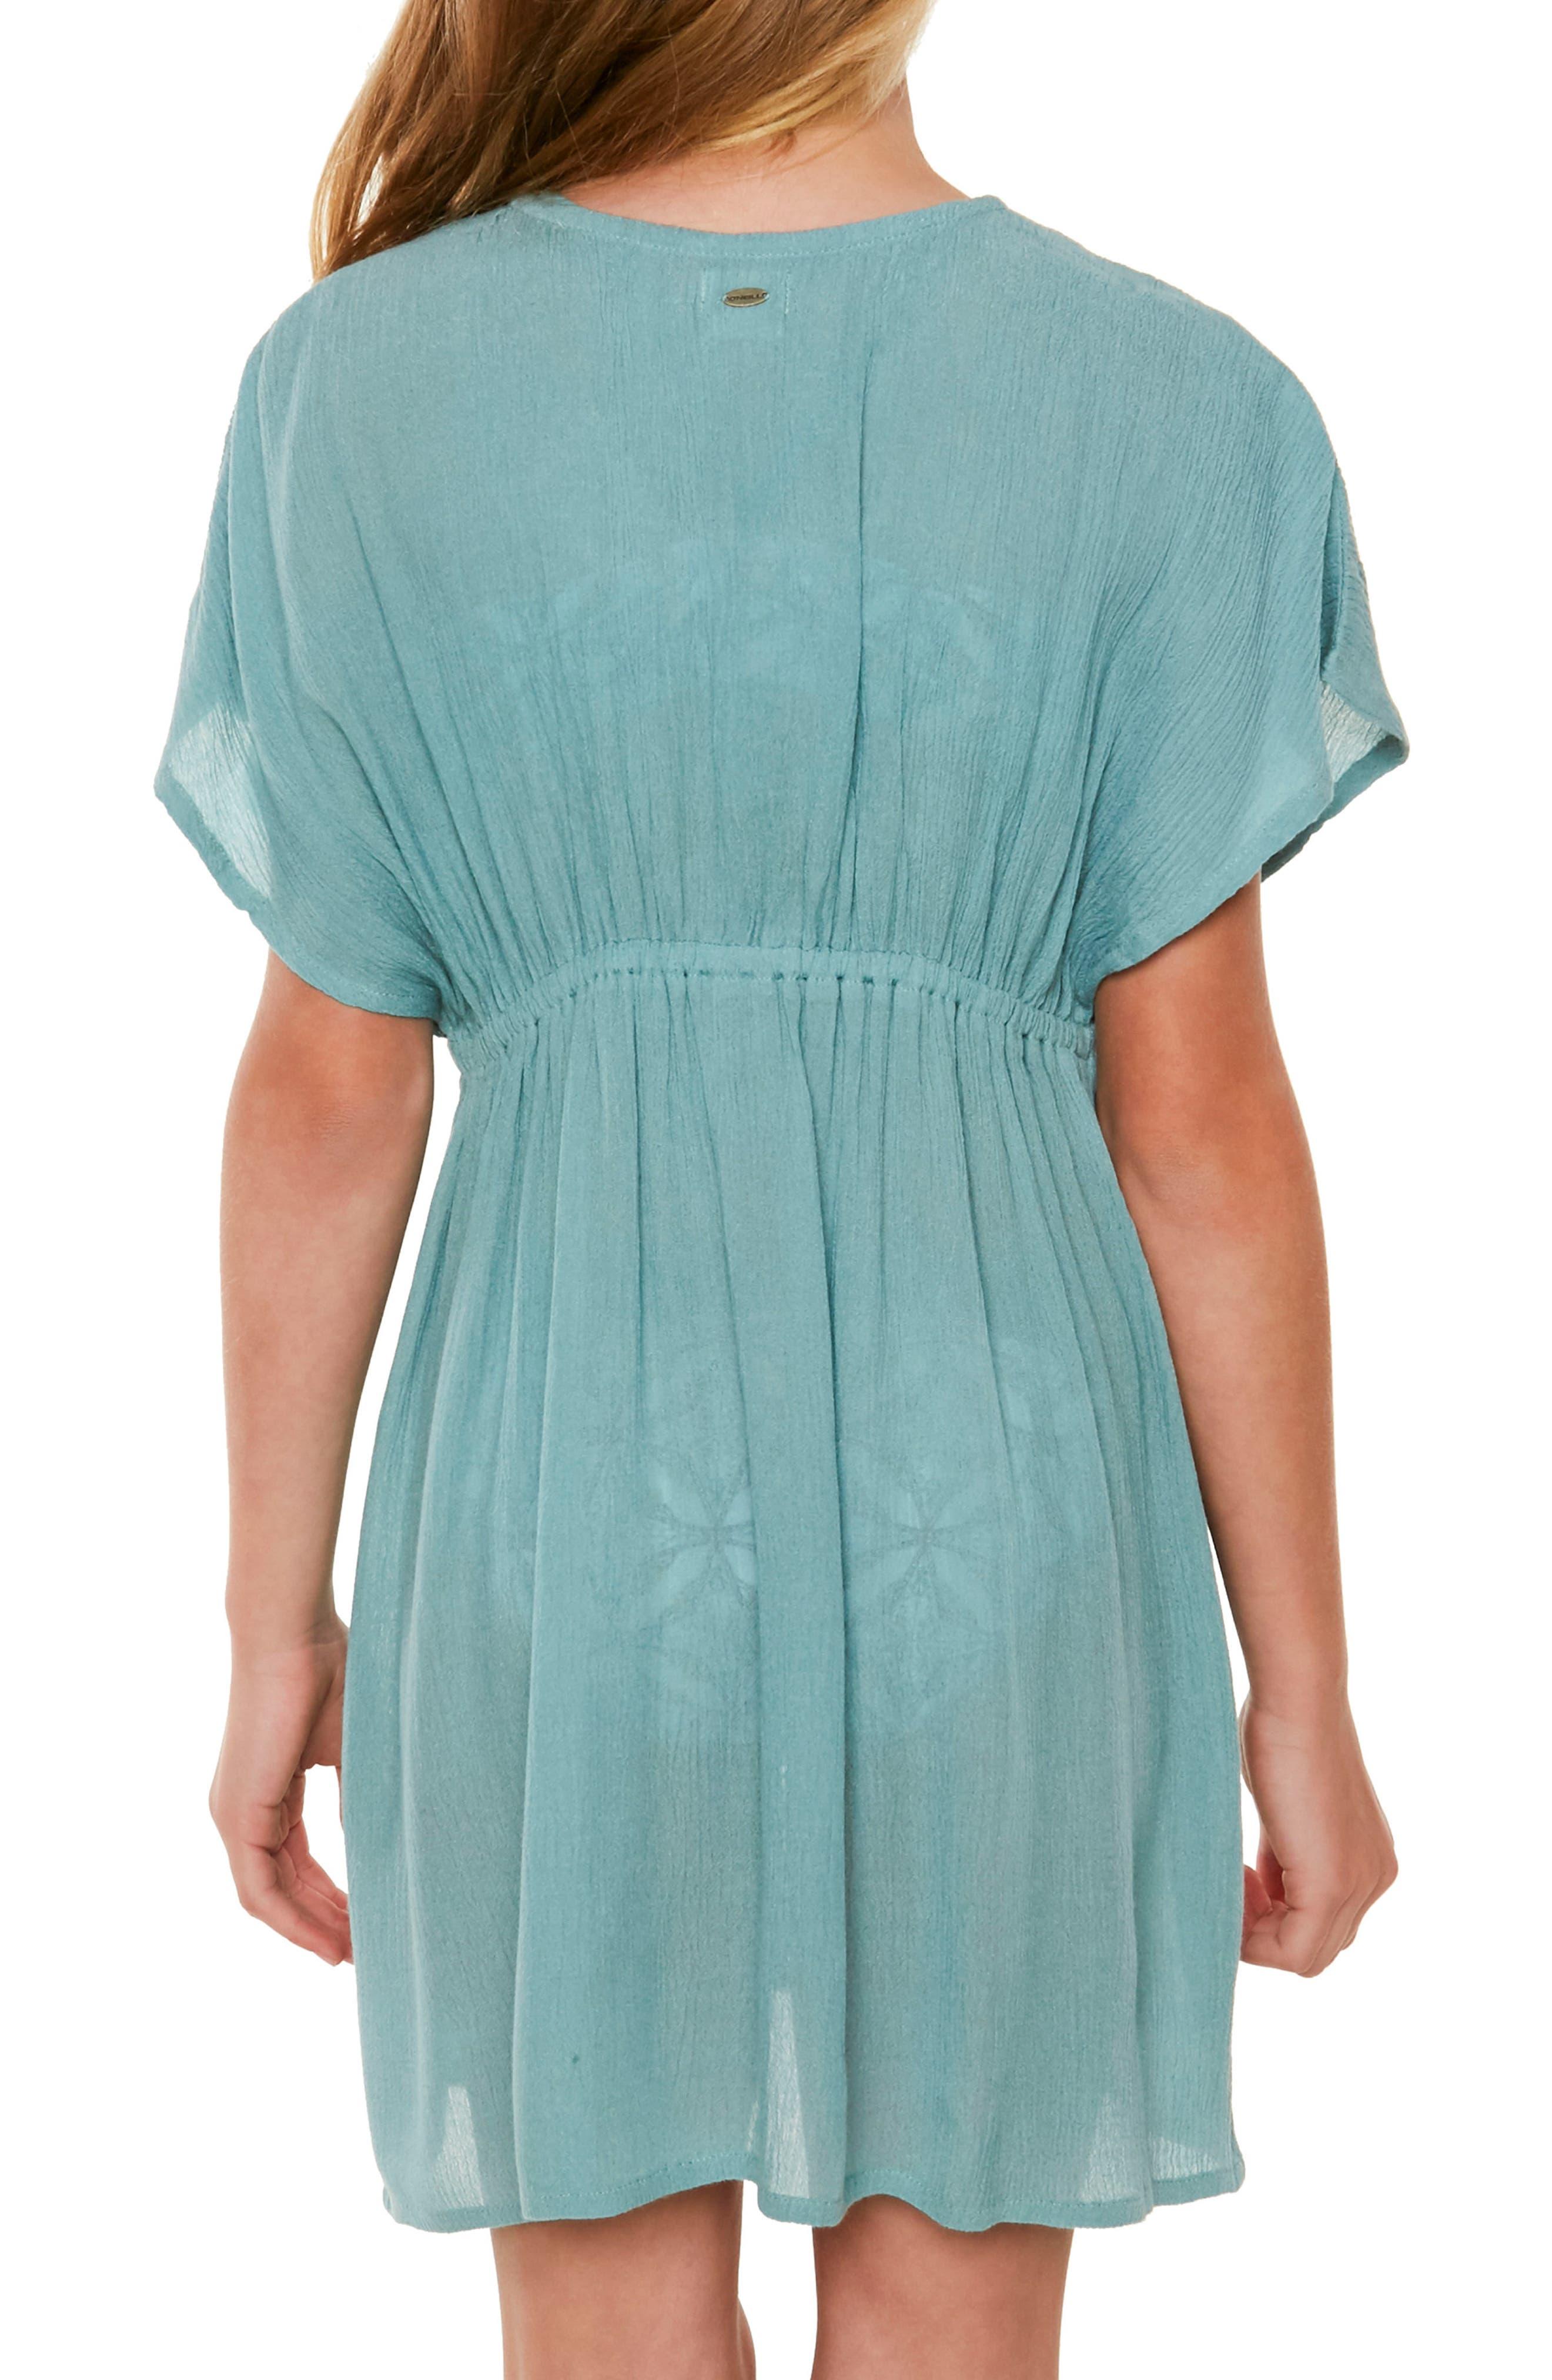 Kayla Crochet Cover-Up Dress,                             Alternate thumbnail 4, color,                             420